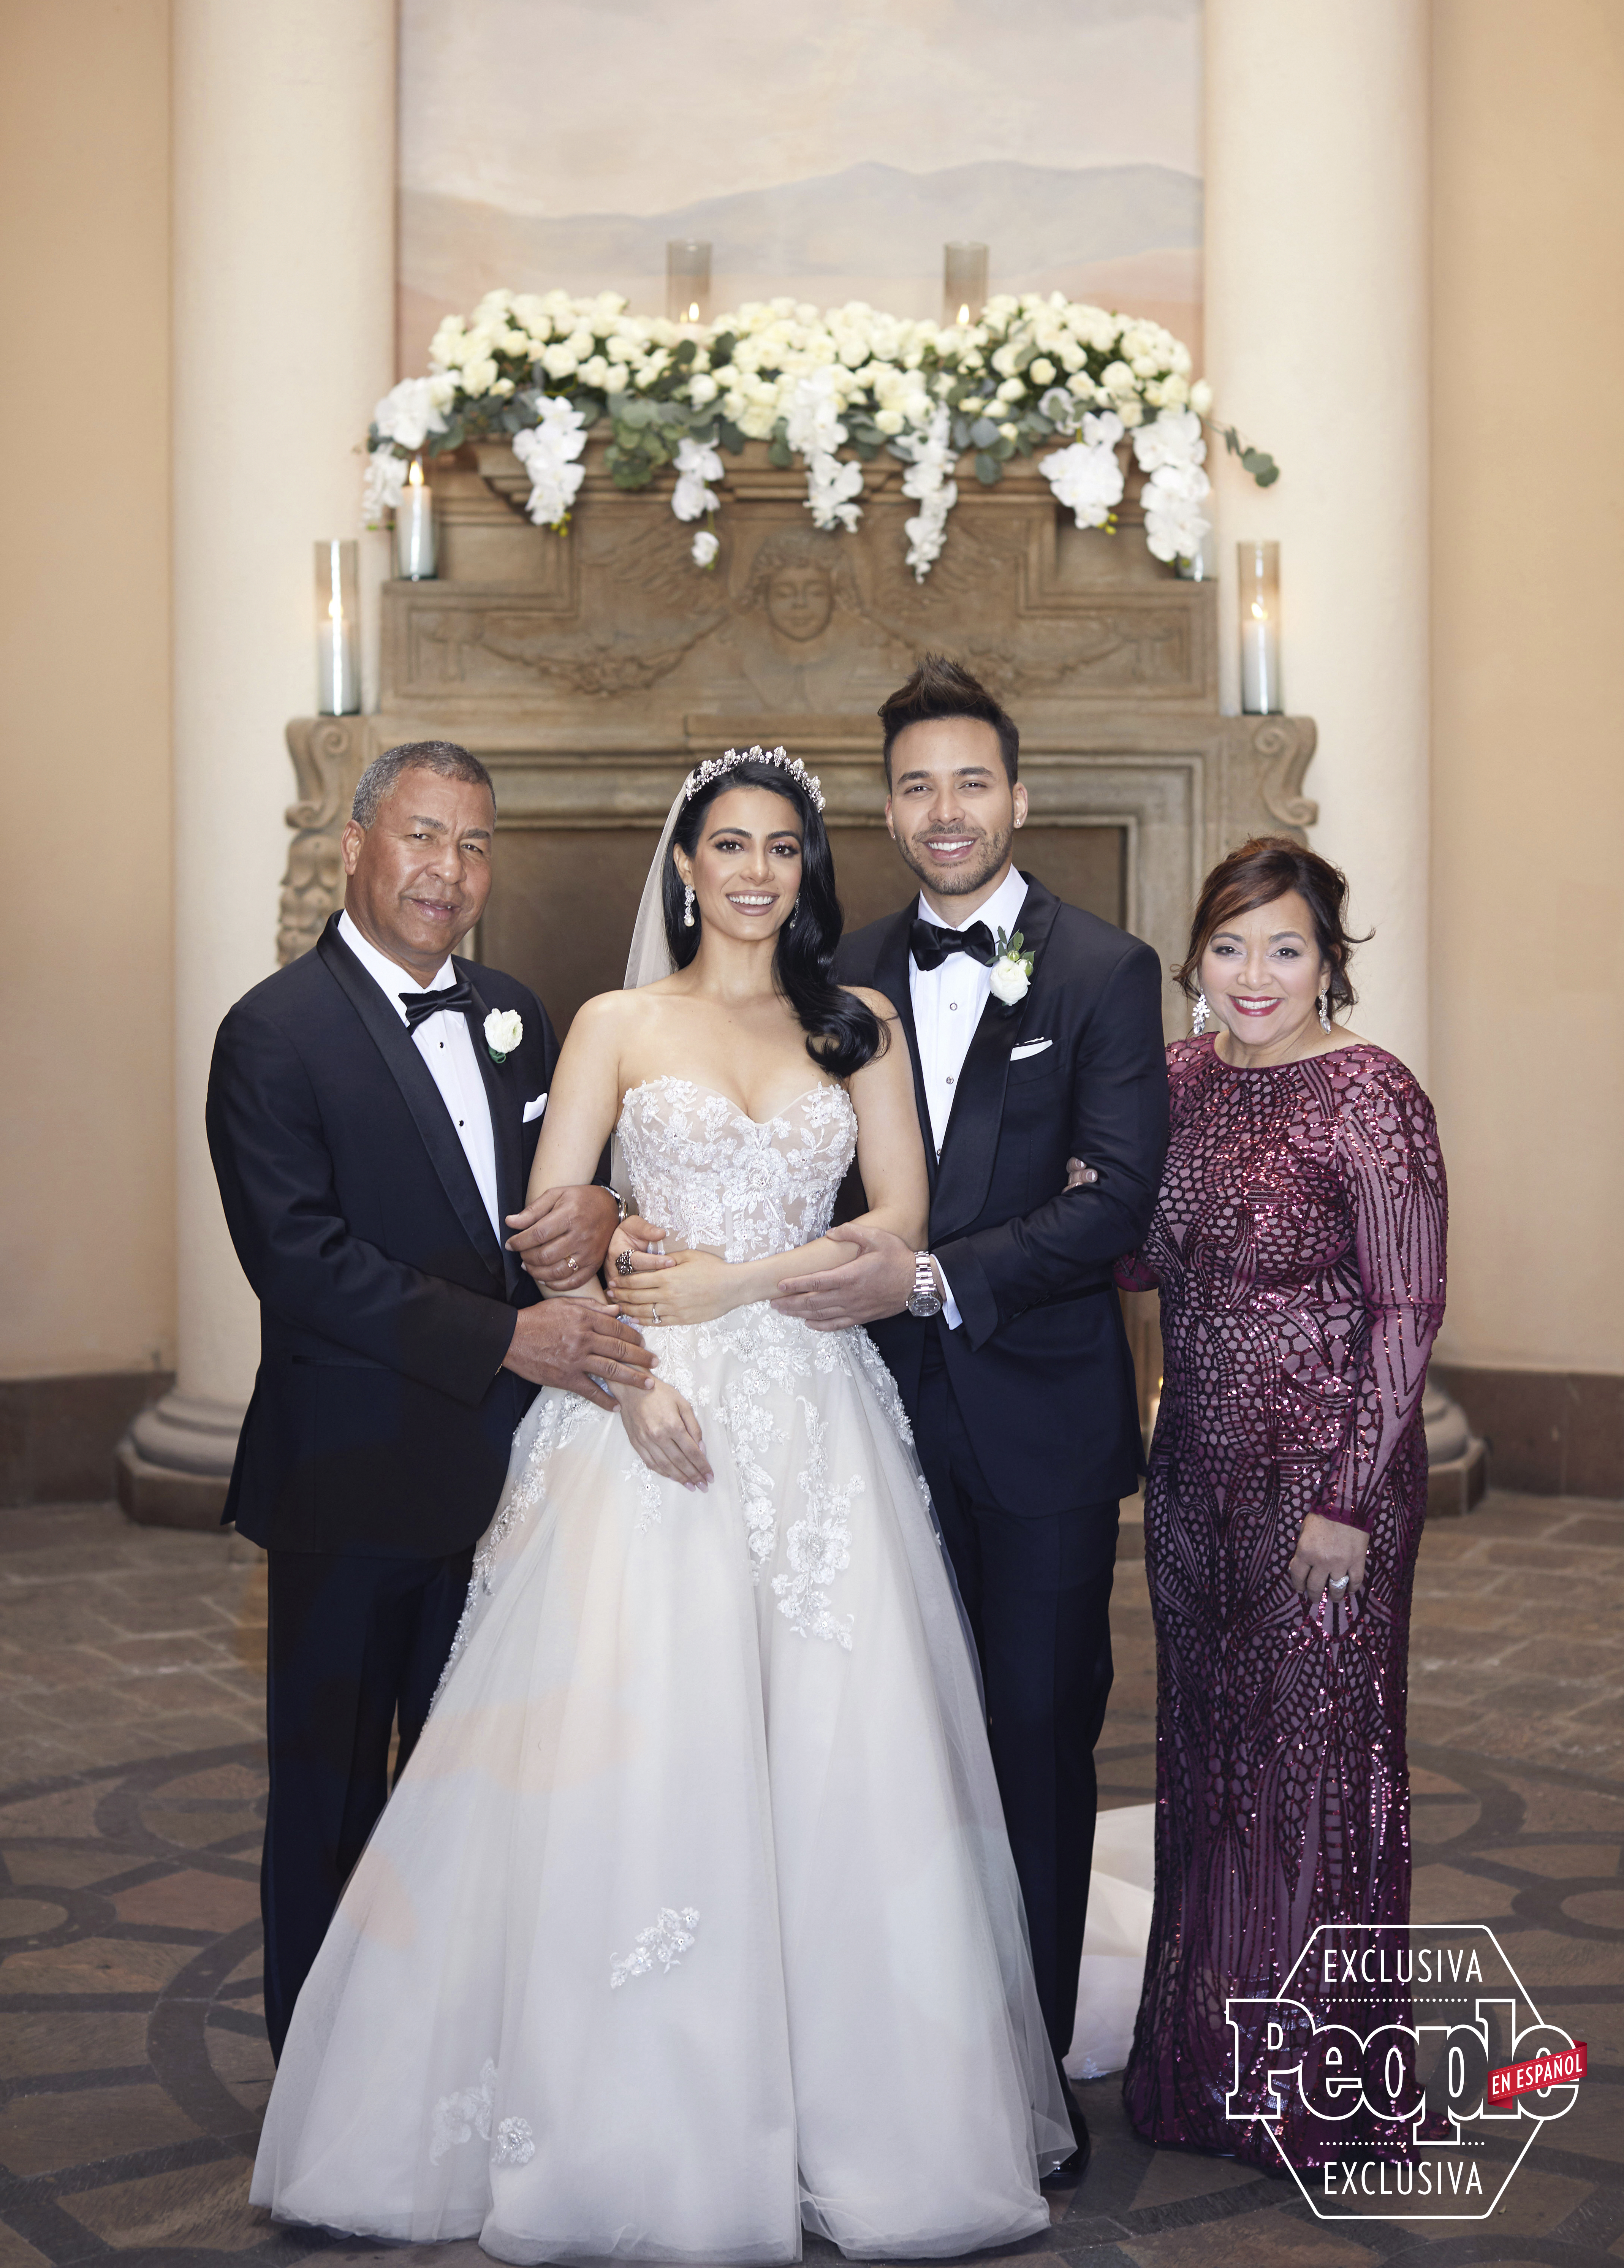 Prince Royce y Emeraude Toubia boda